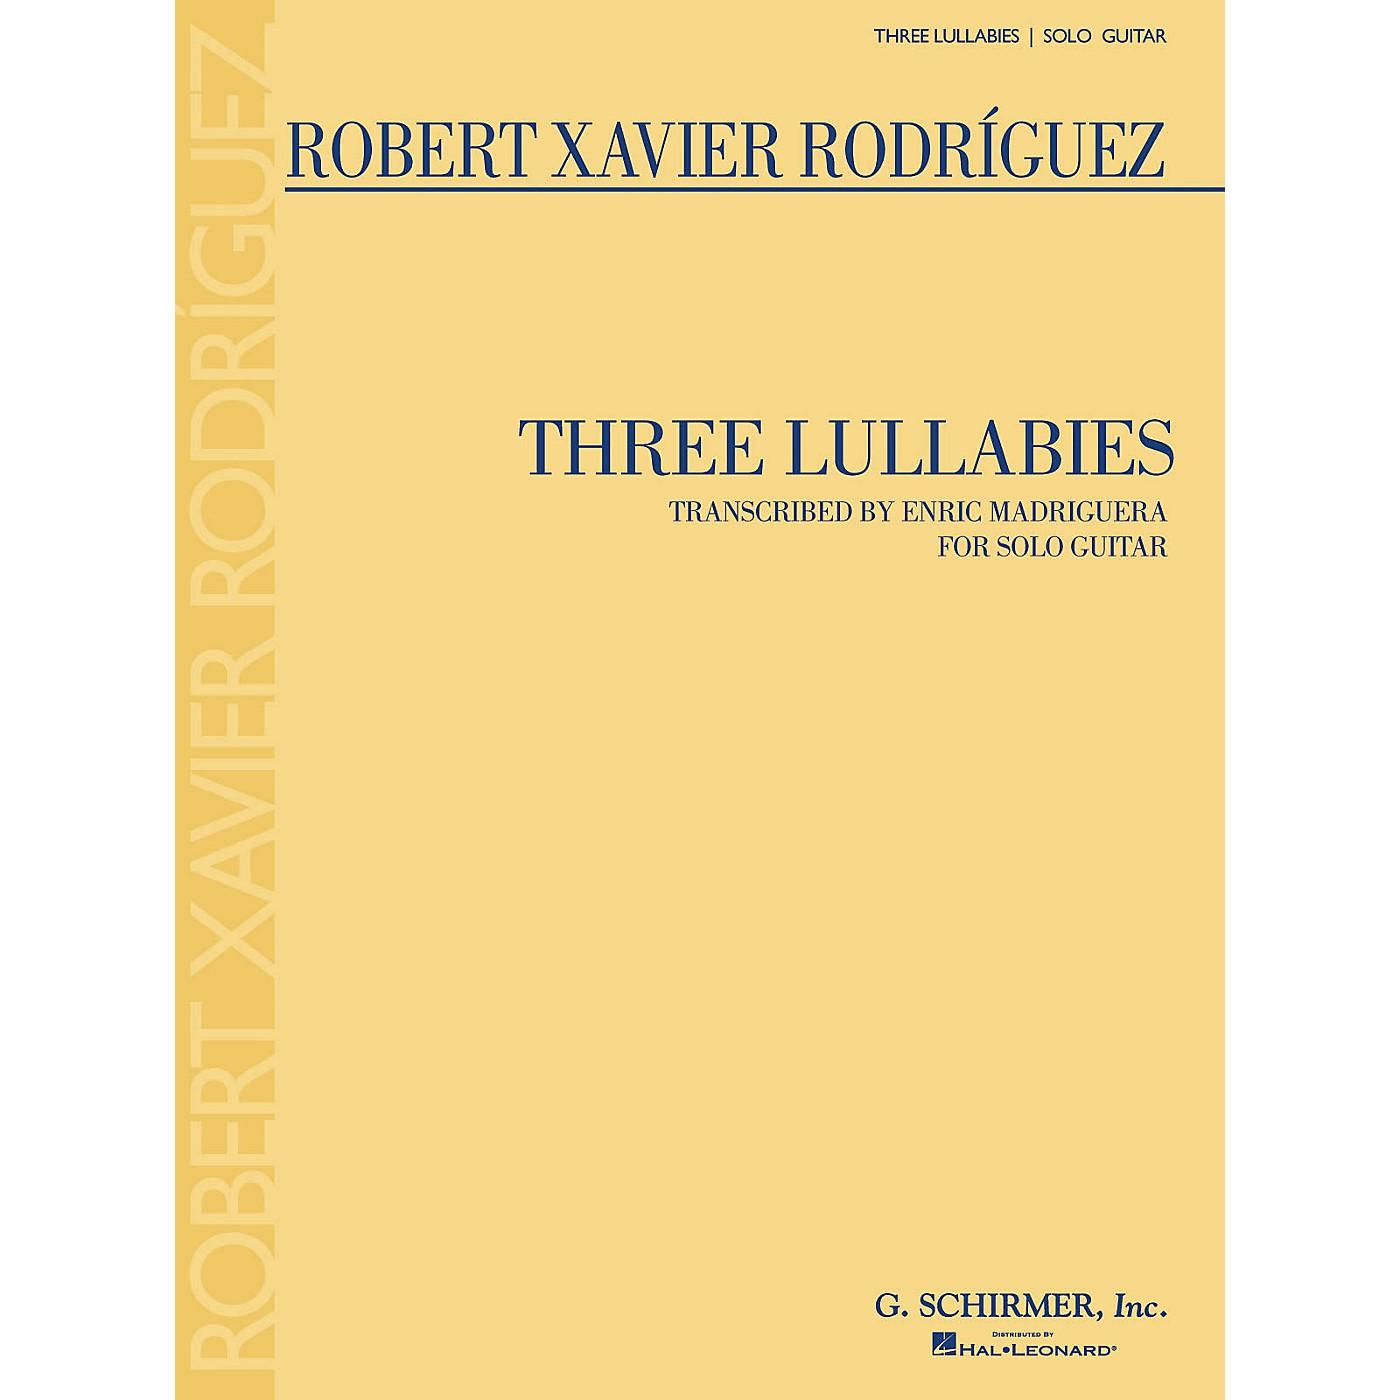 G. Schirmer Three Lullabies (for Solo Guitar) Guitar Series thumbnail